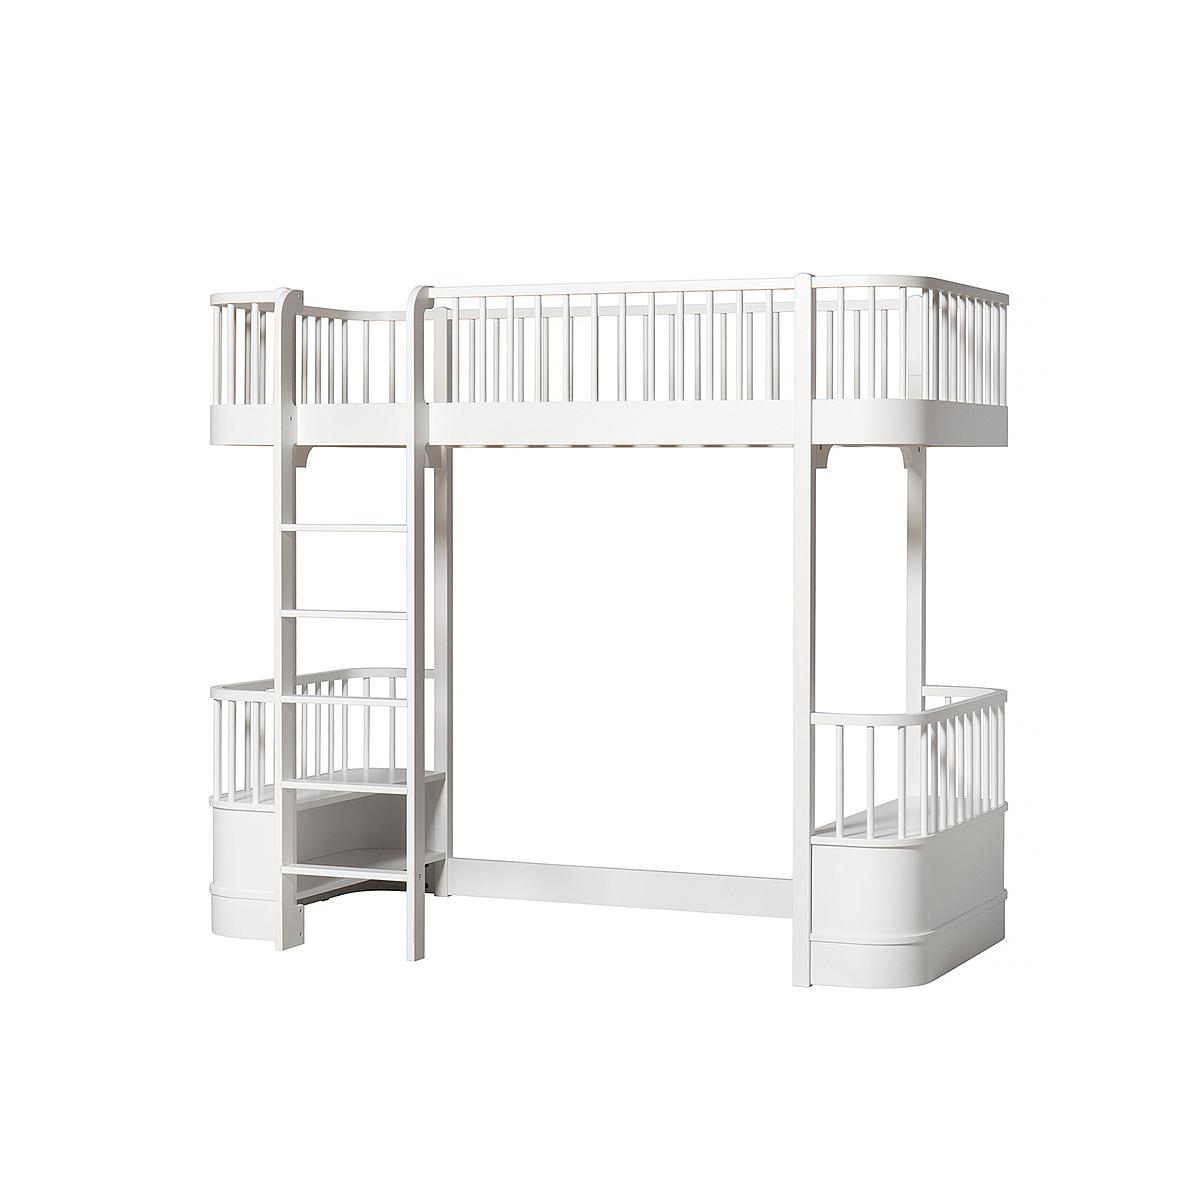 Lit évolutif mezzanine 90x200cm WOOD ORIGINAL Oliver Furniture blanc